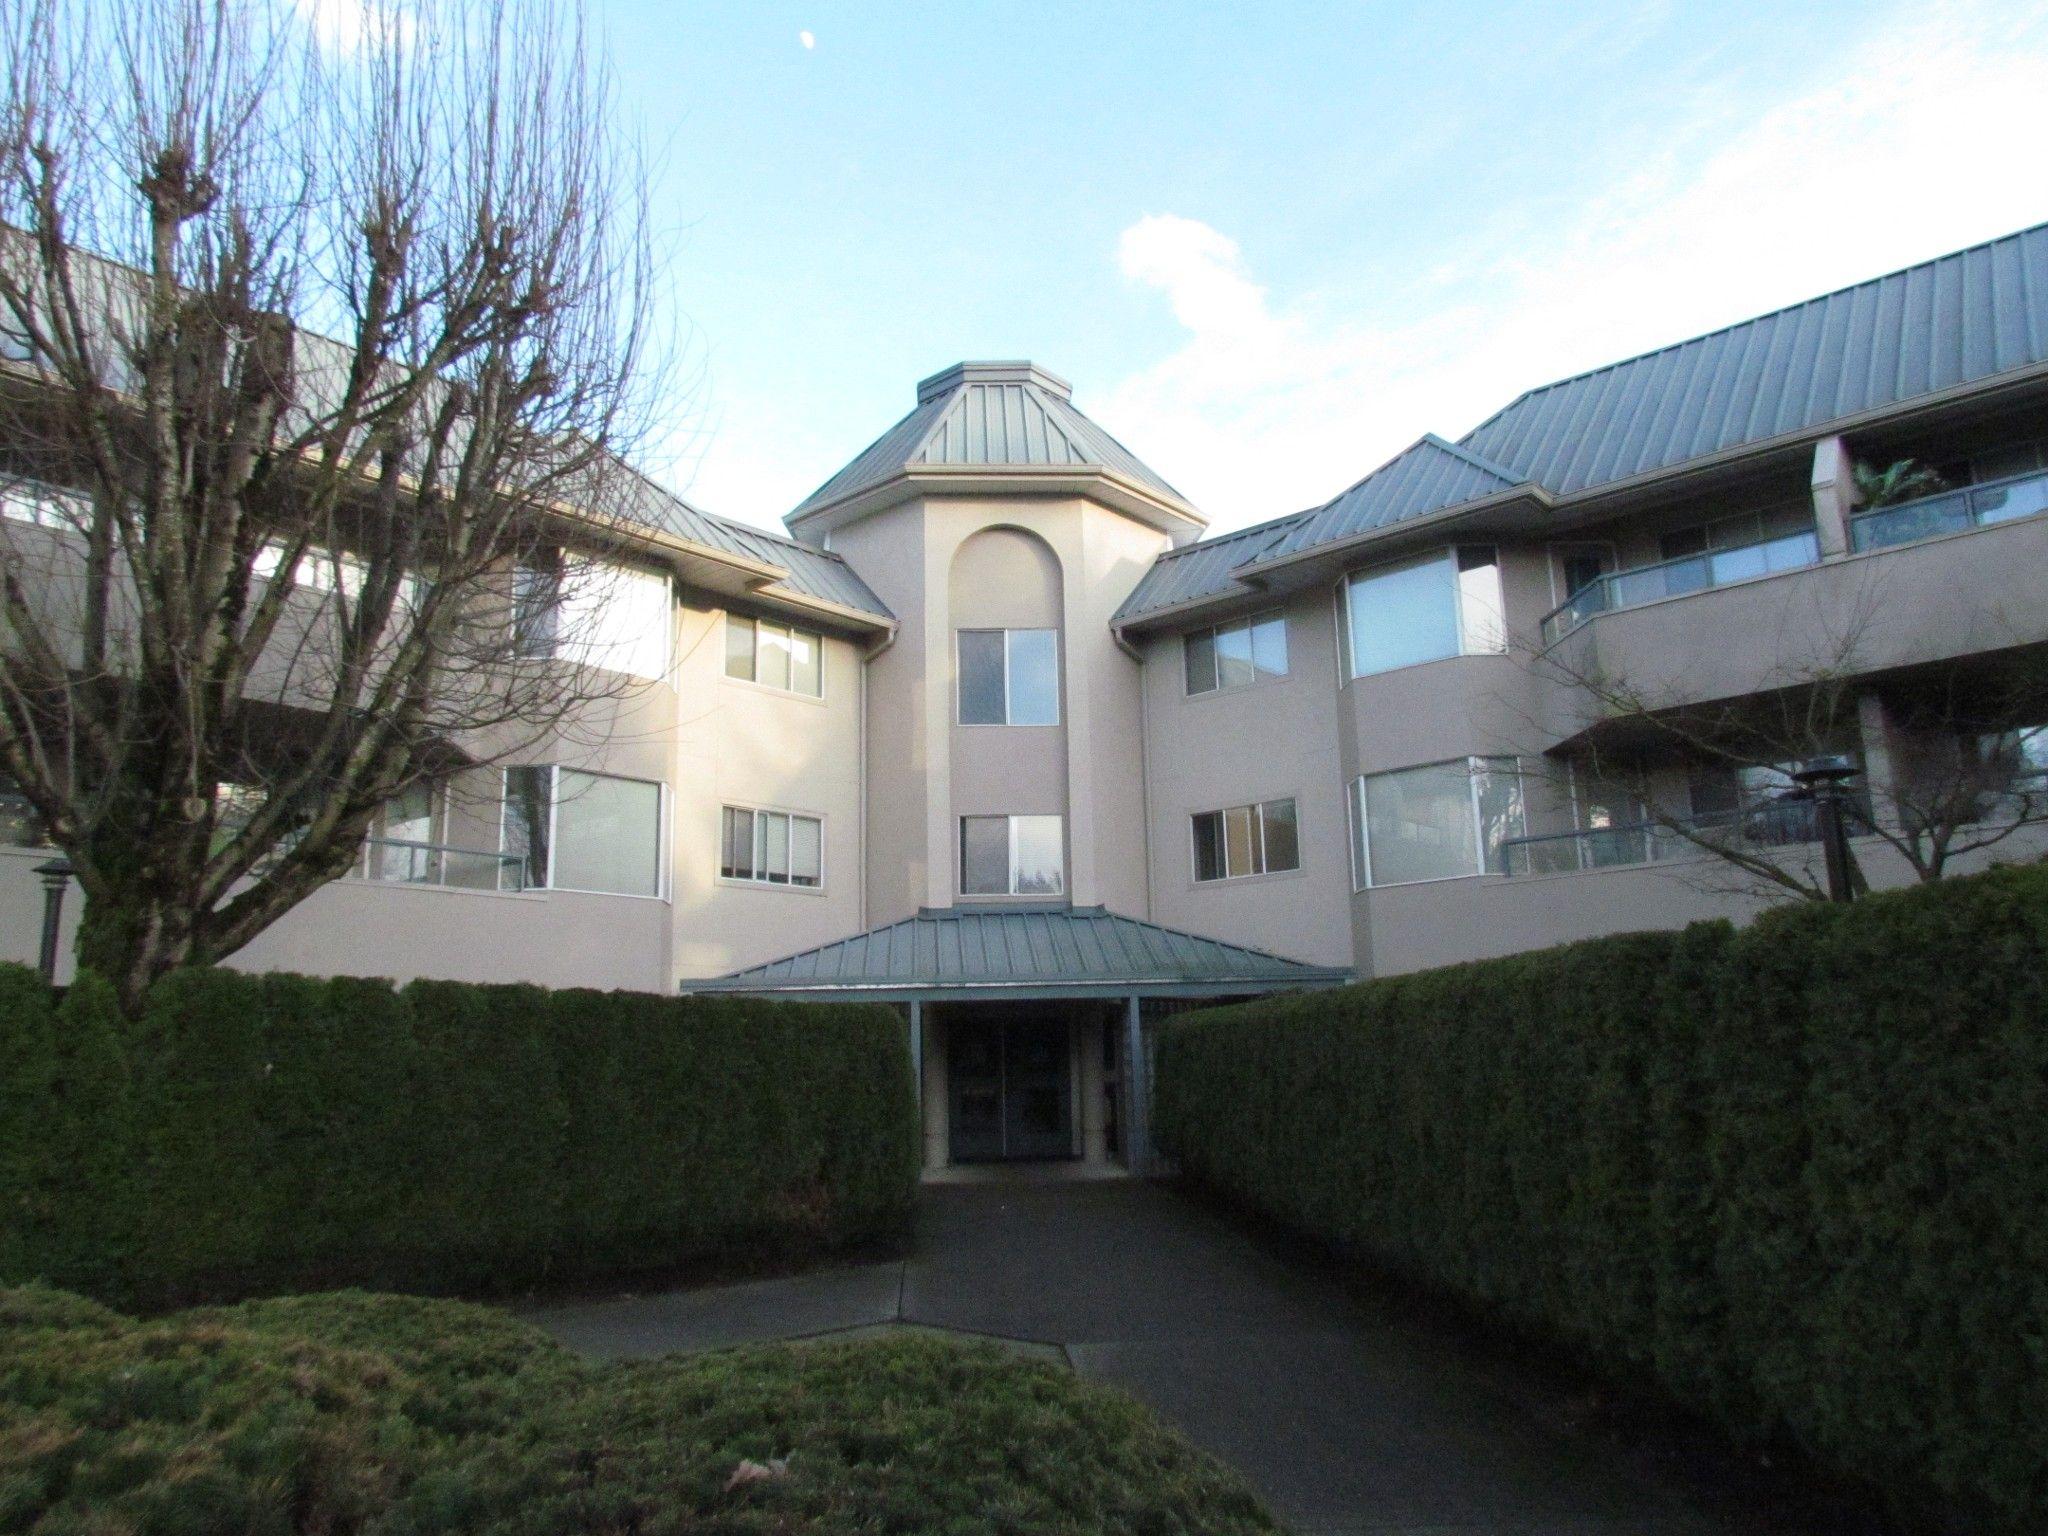 Main Photo: #510 2700 McCallum Rd. in Abbotsford: Central Abbotsford Condo for rent